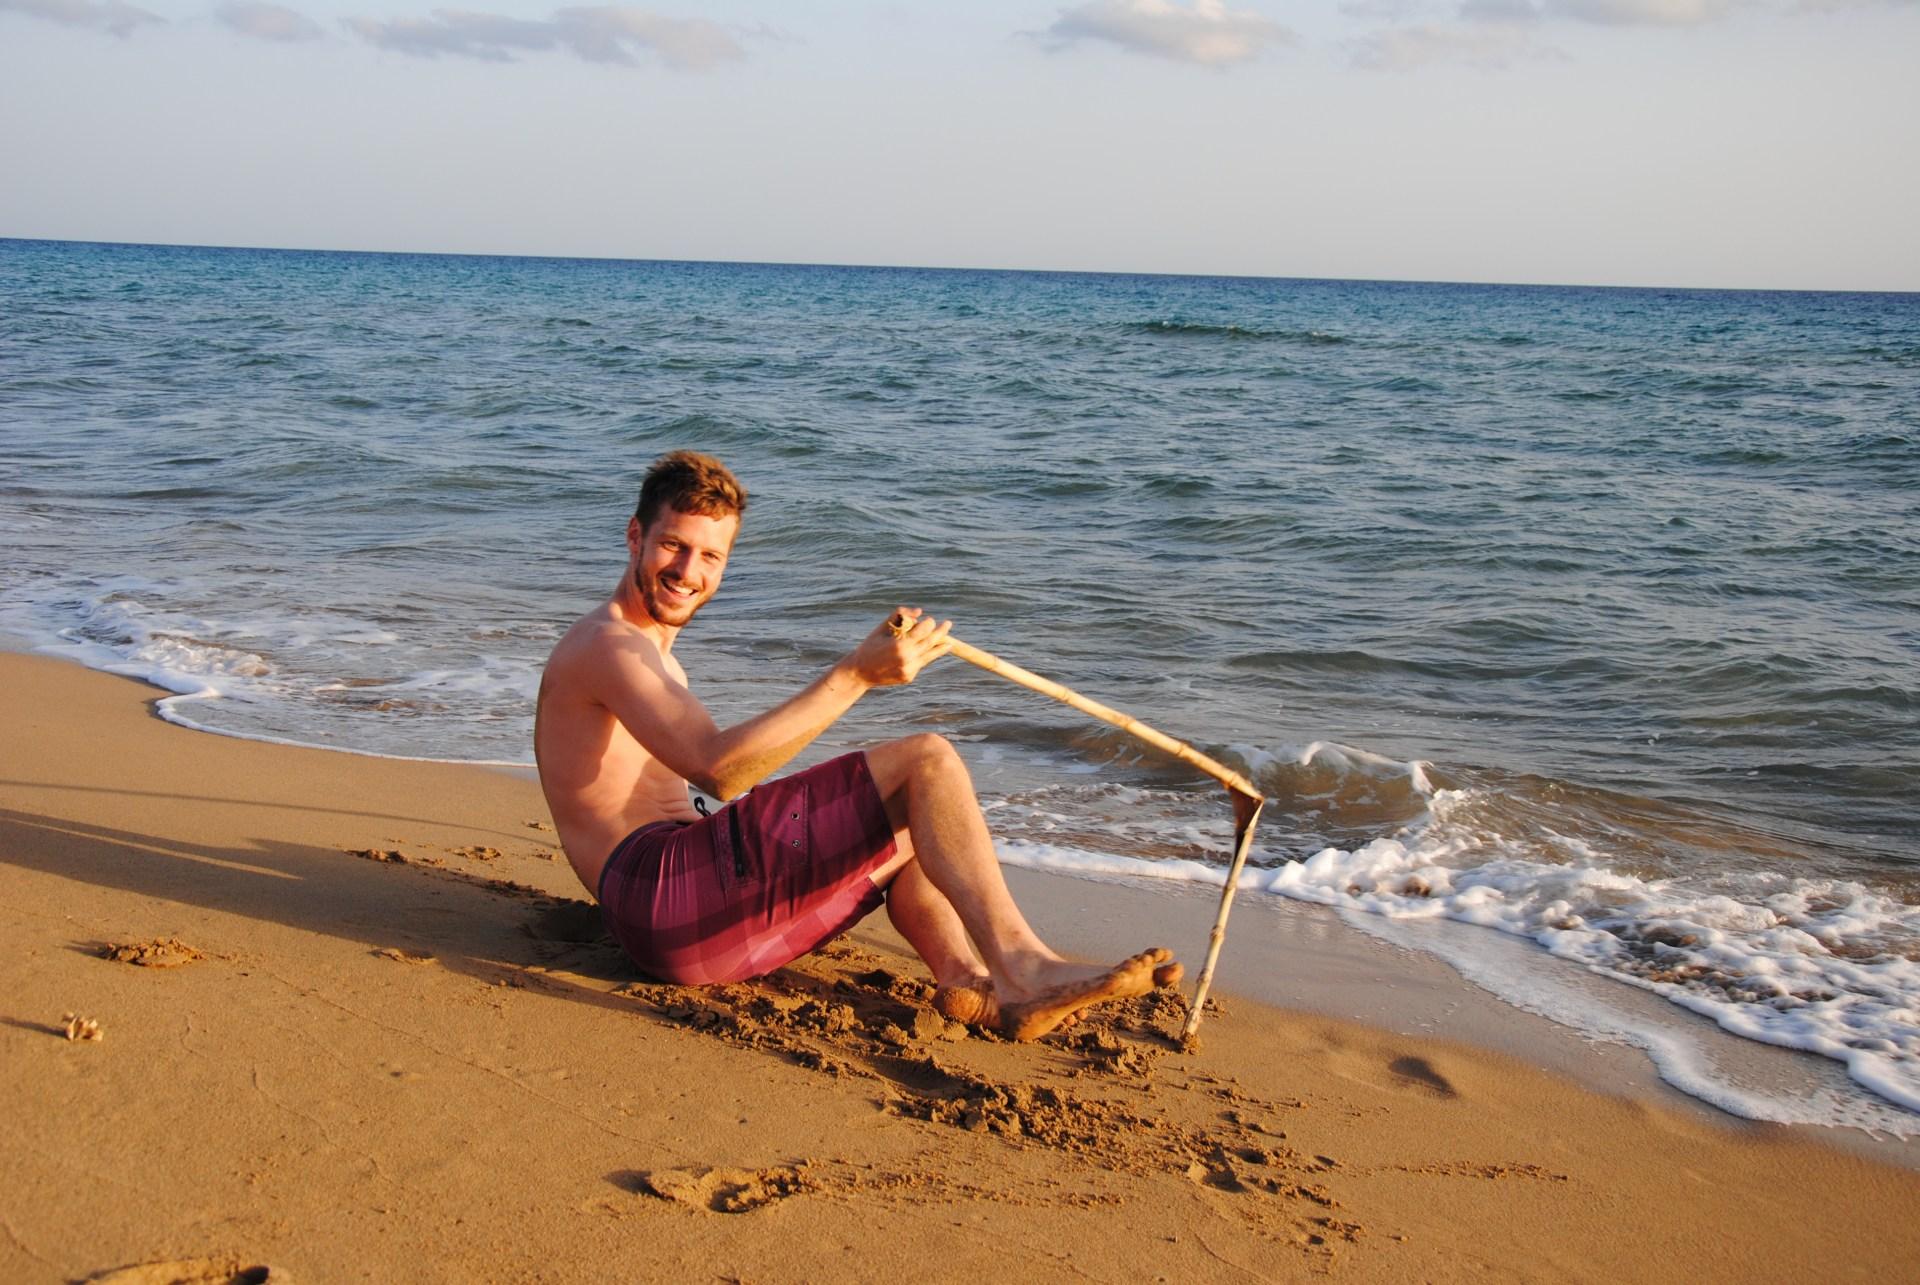 Sebastian liegt lachend am Strand und hält einen kaputten Stock